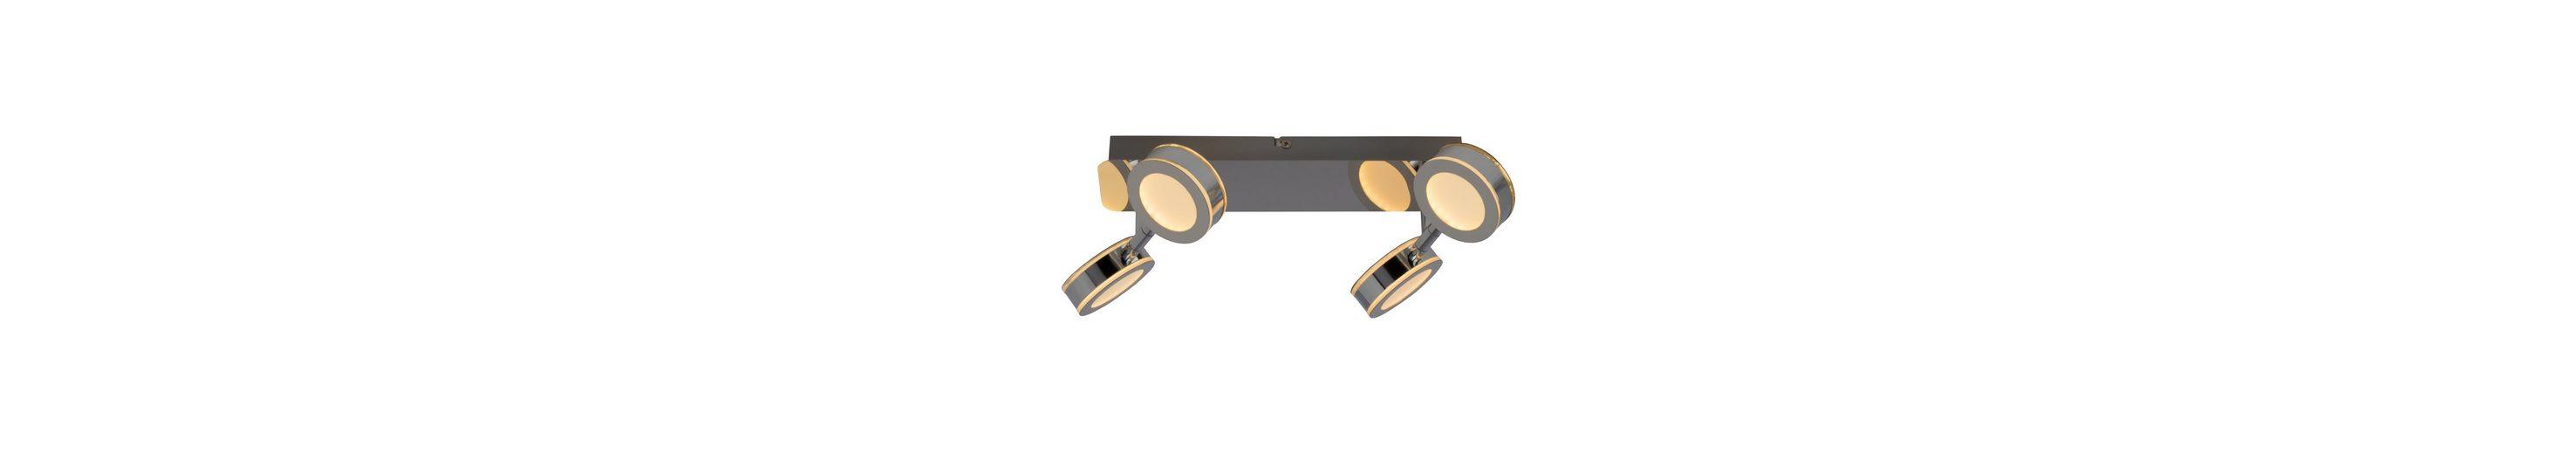 Brilliant Leuchten Movable LED Deckenleuchte, 4-flammig chrom